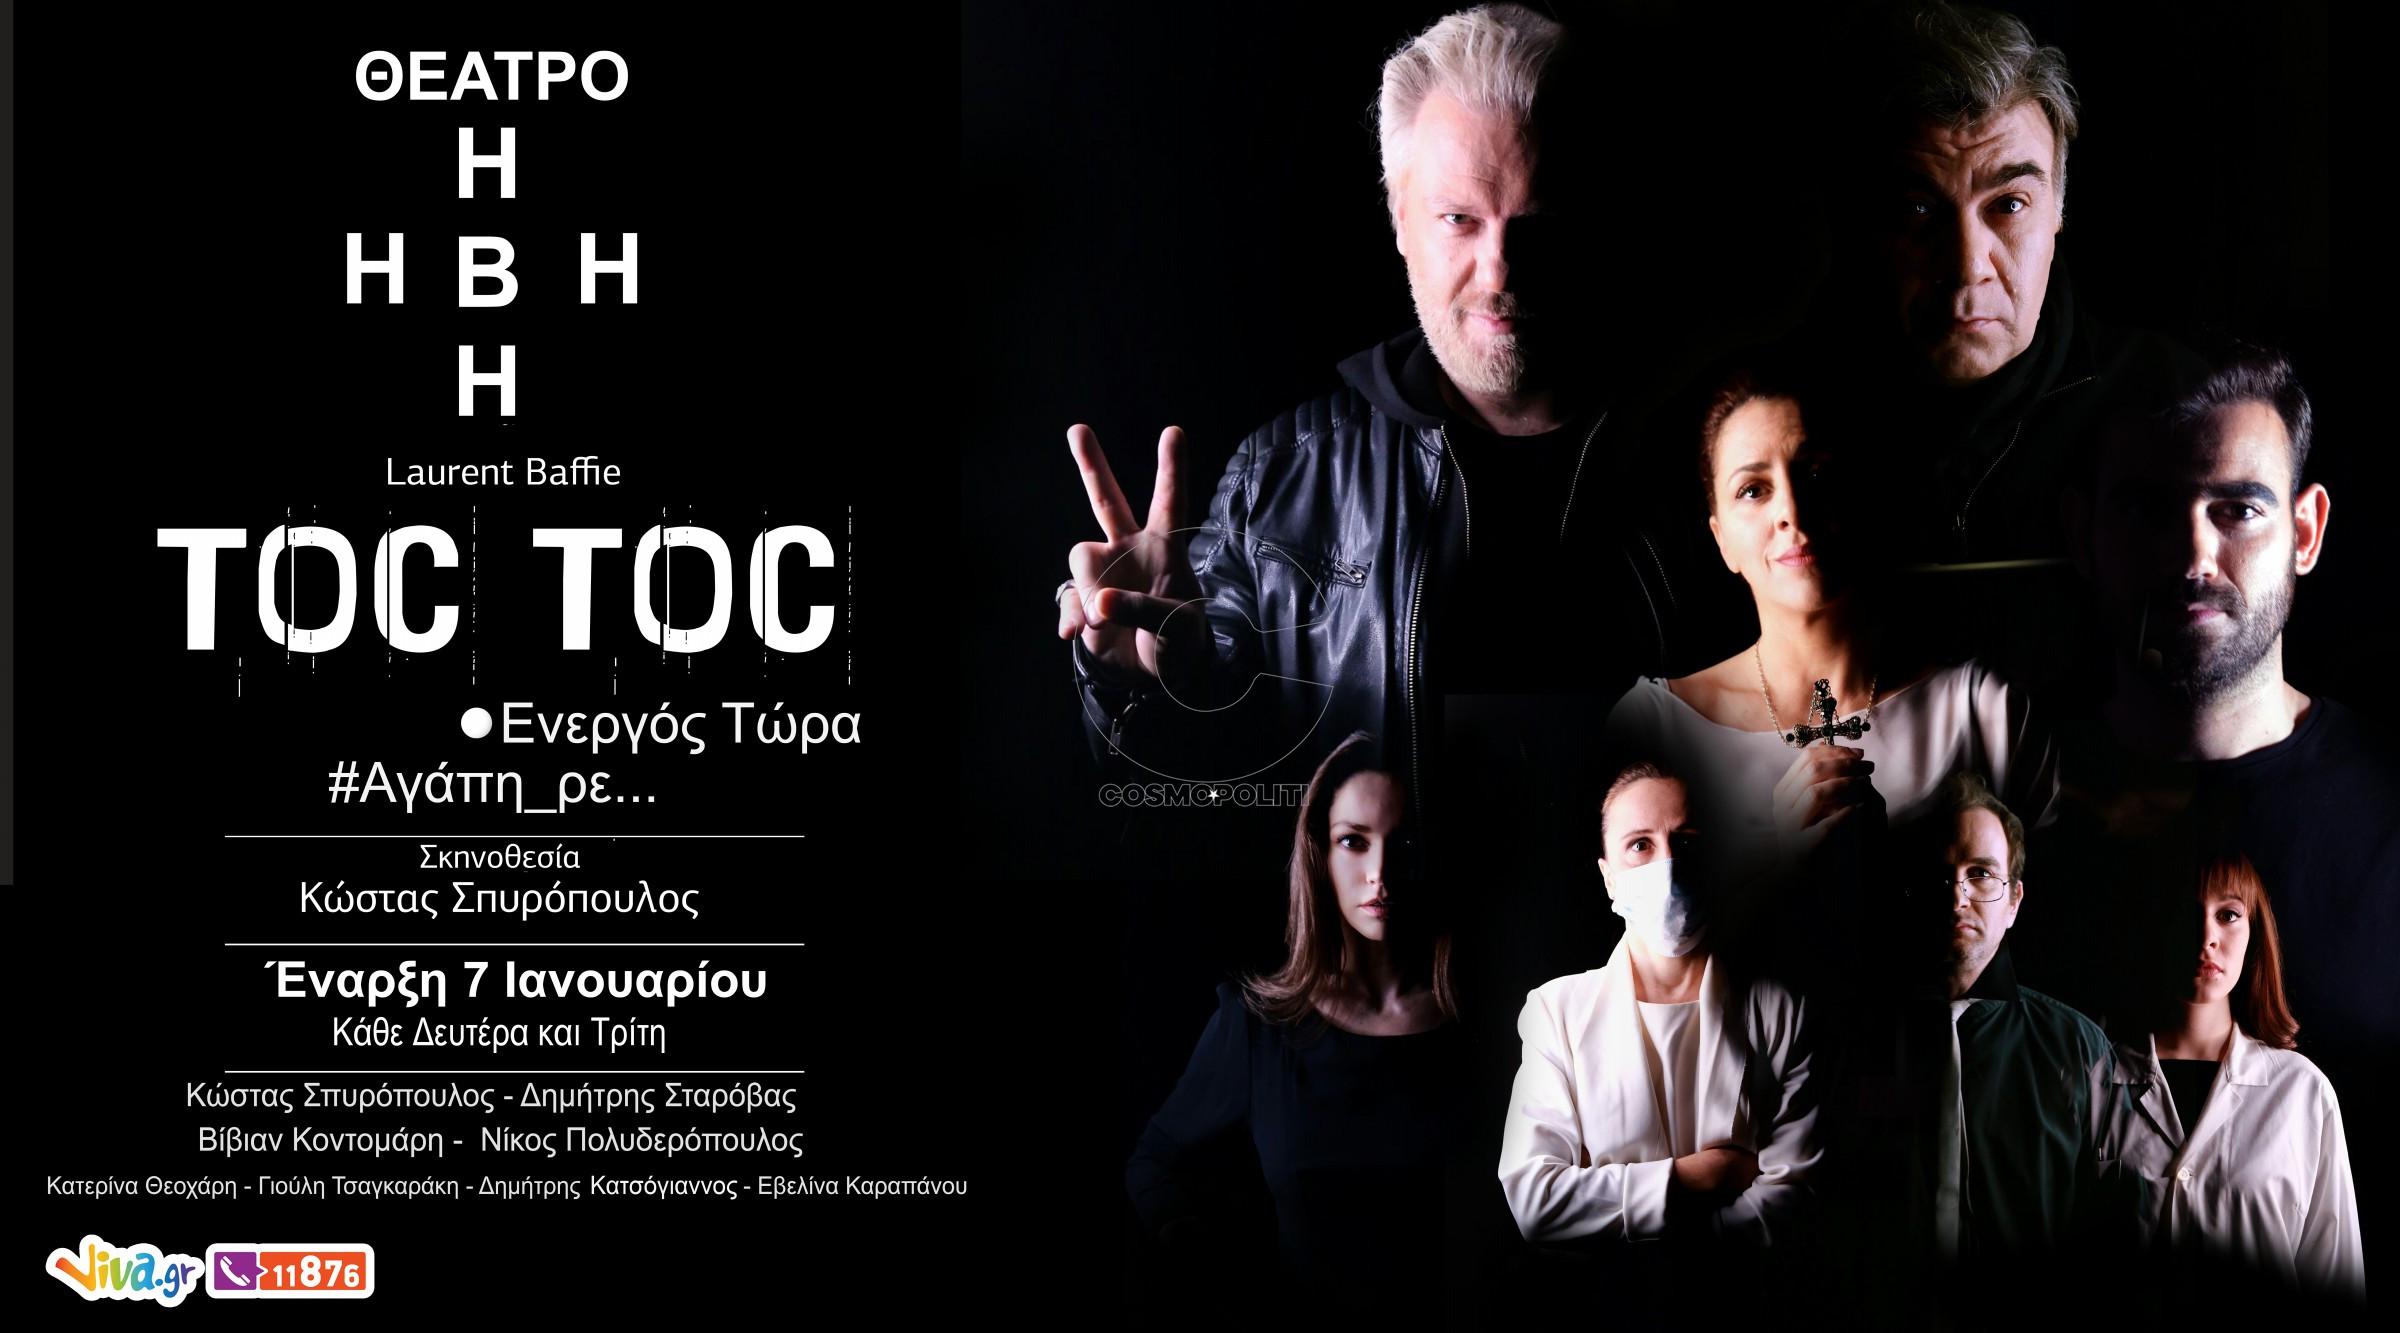 5c8156f97095 Τοc Toc  η θρυλική παράσταση-ψυχοθεραπεία επιστρέφει στο θέατρο Ήβη ...